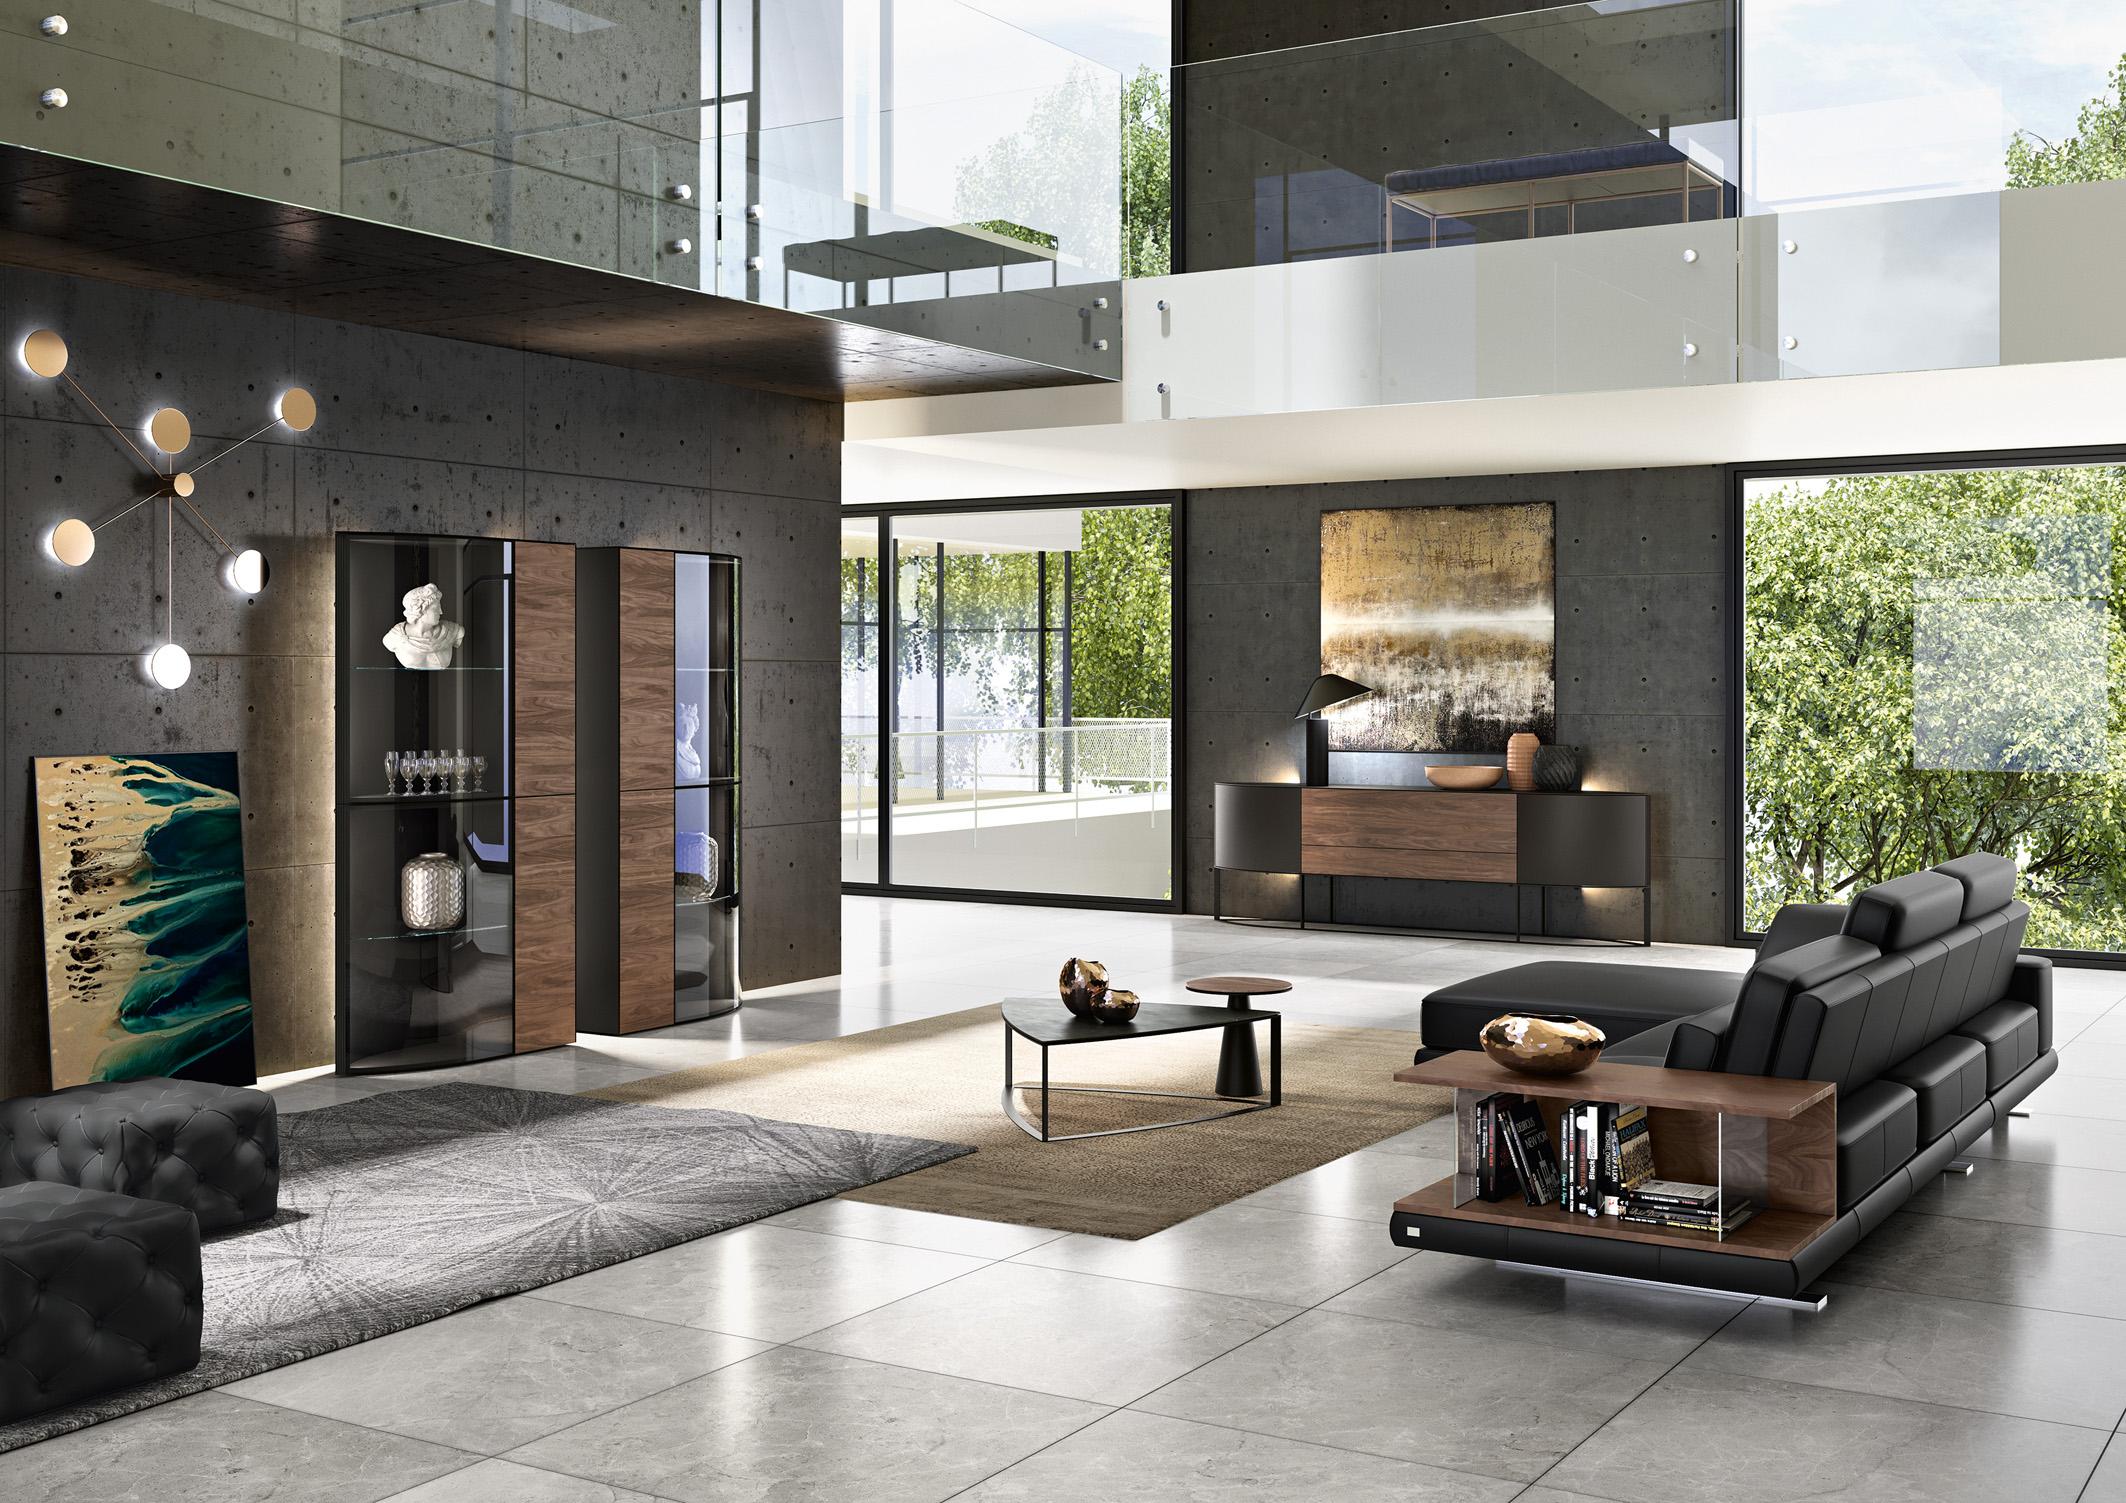 vdm 2017 pm huelsta3. Black Bedroom Furniture Sets. Home Design Ideas